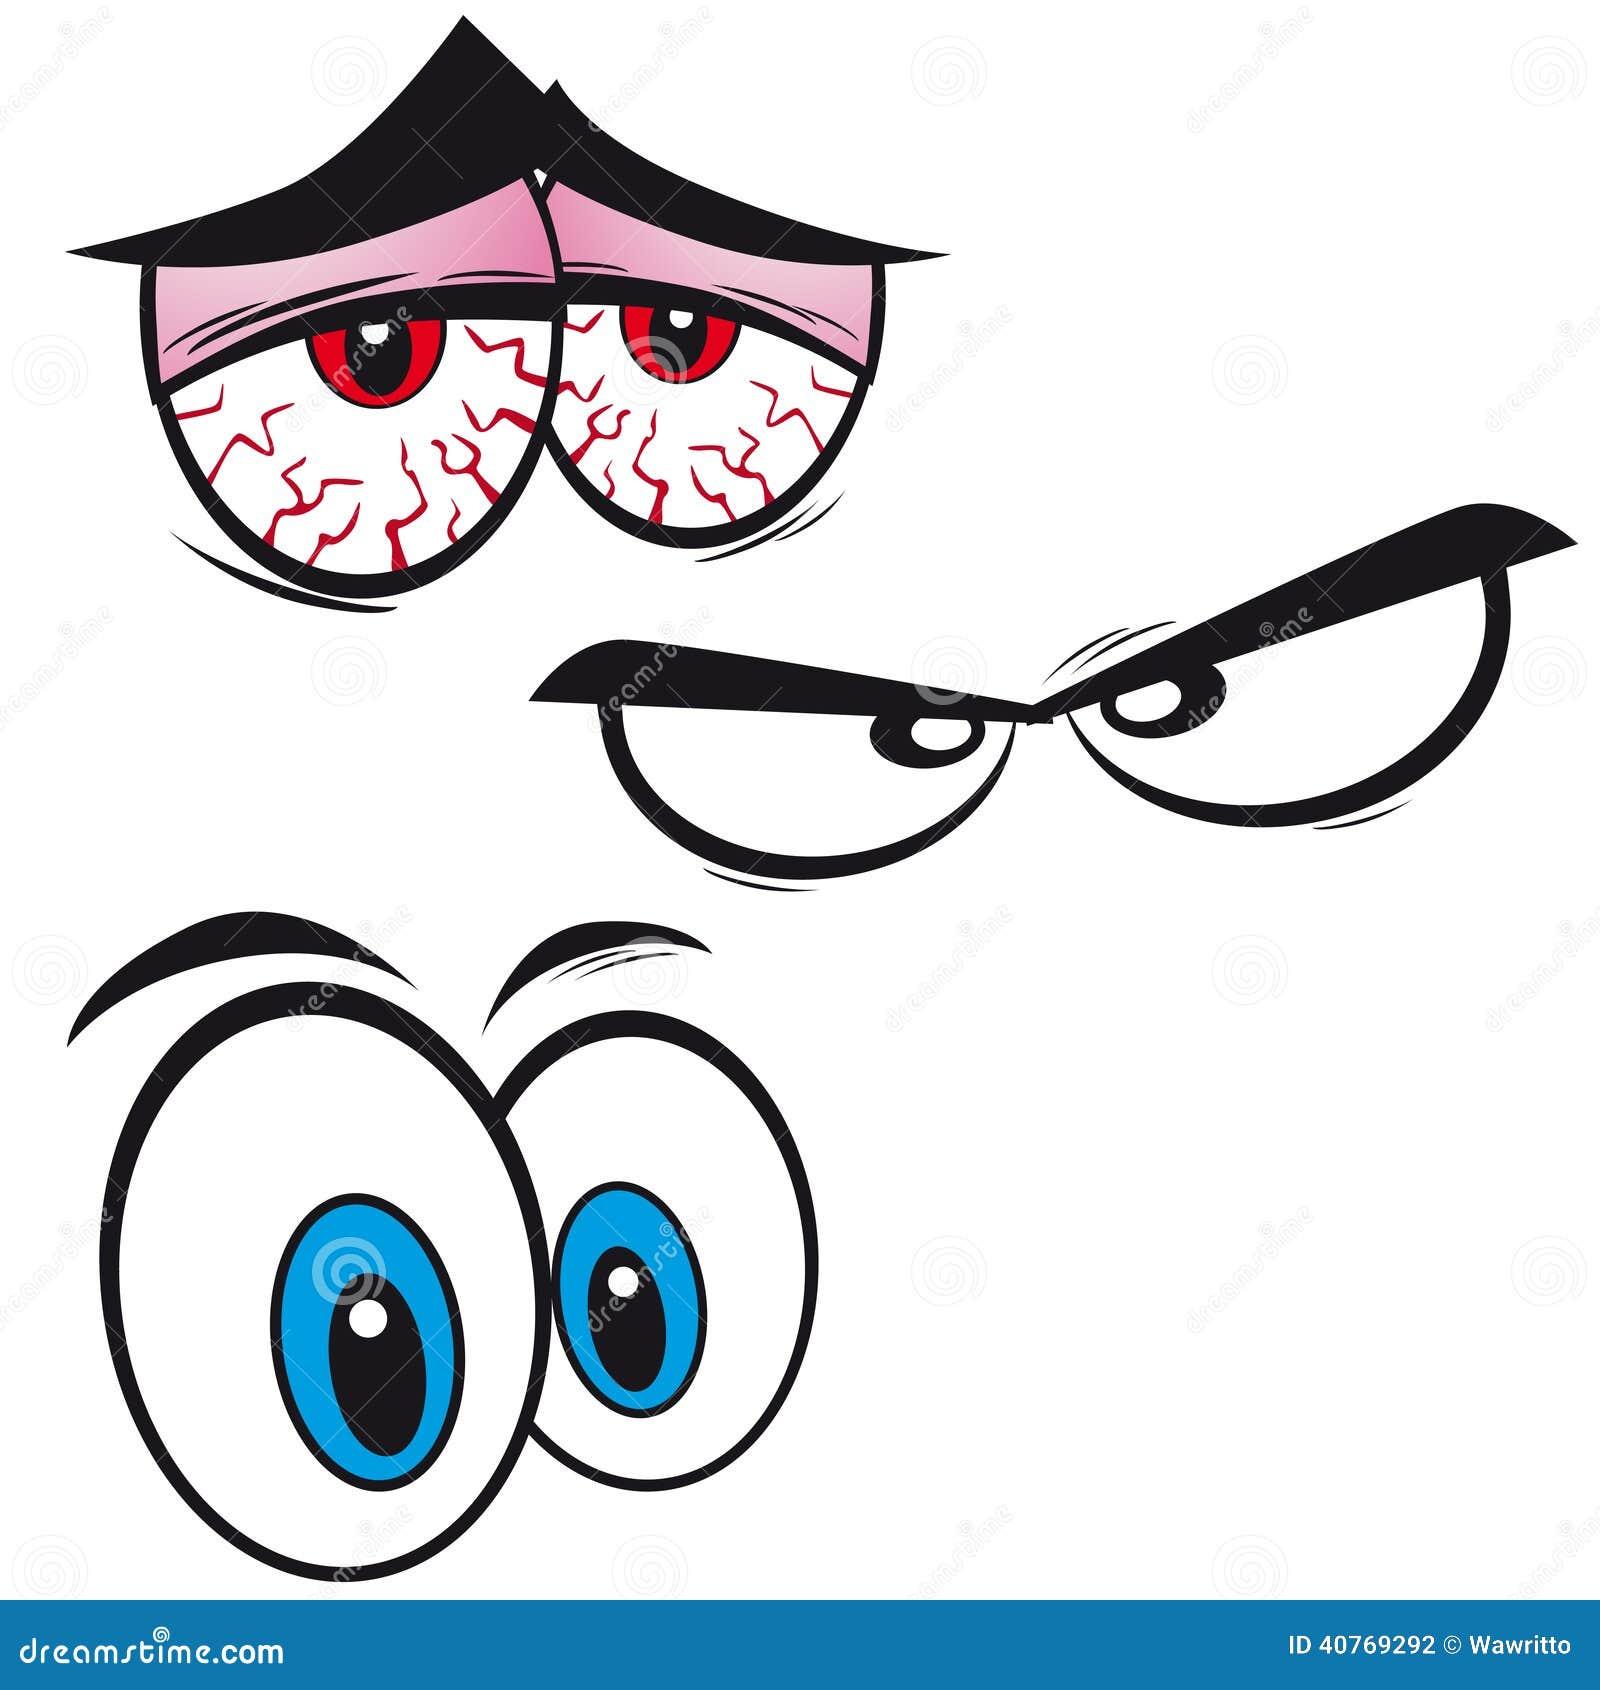 Weed Eyes Cartoon   www.imgkid.com - The Image Kid Has It!